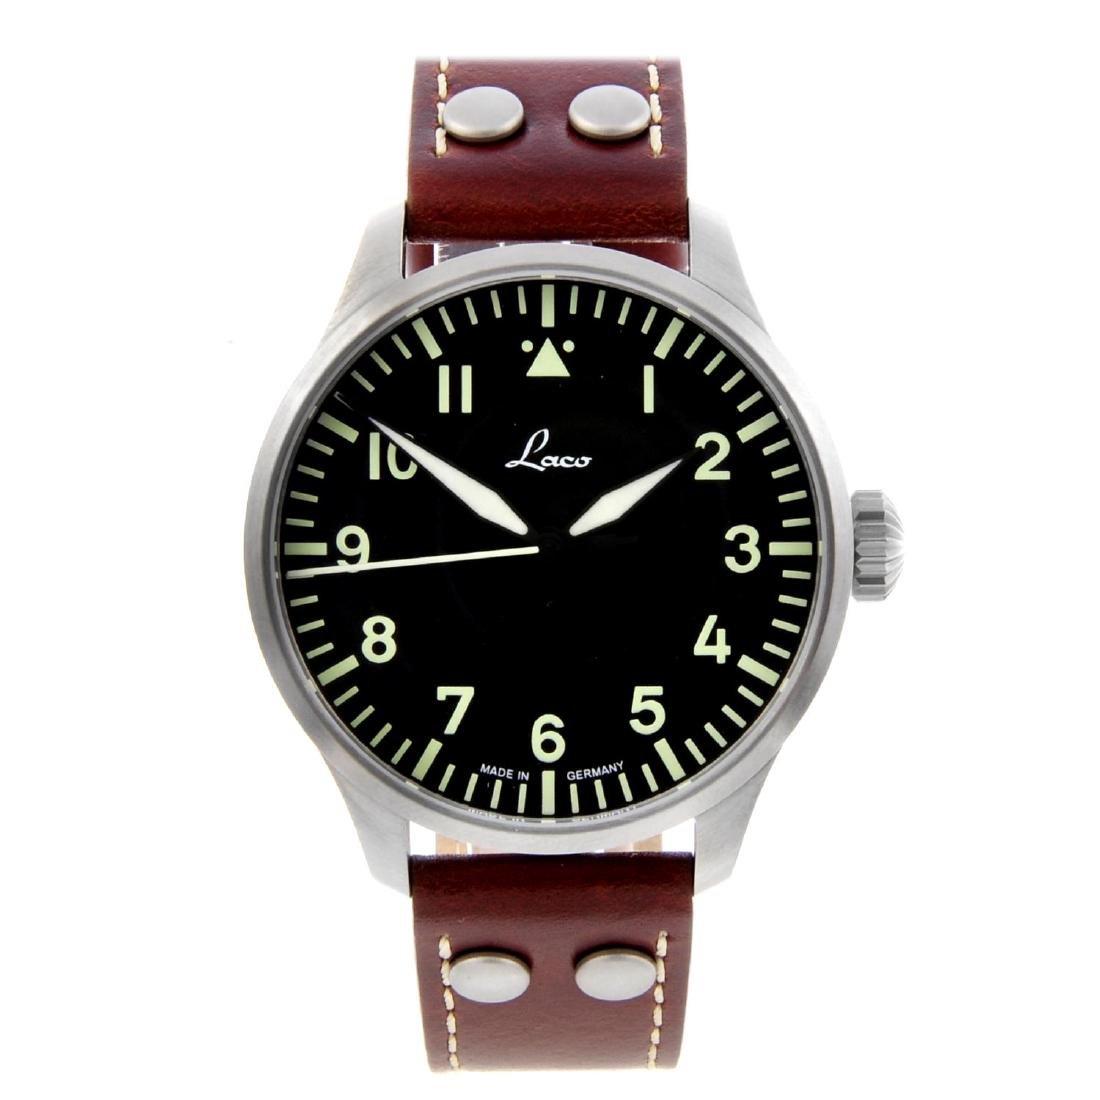 LACO - a gentleman's Augsburg 42 wrist watch. Stainless